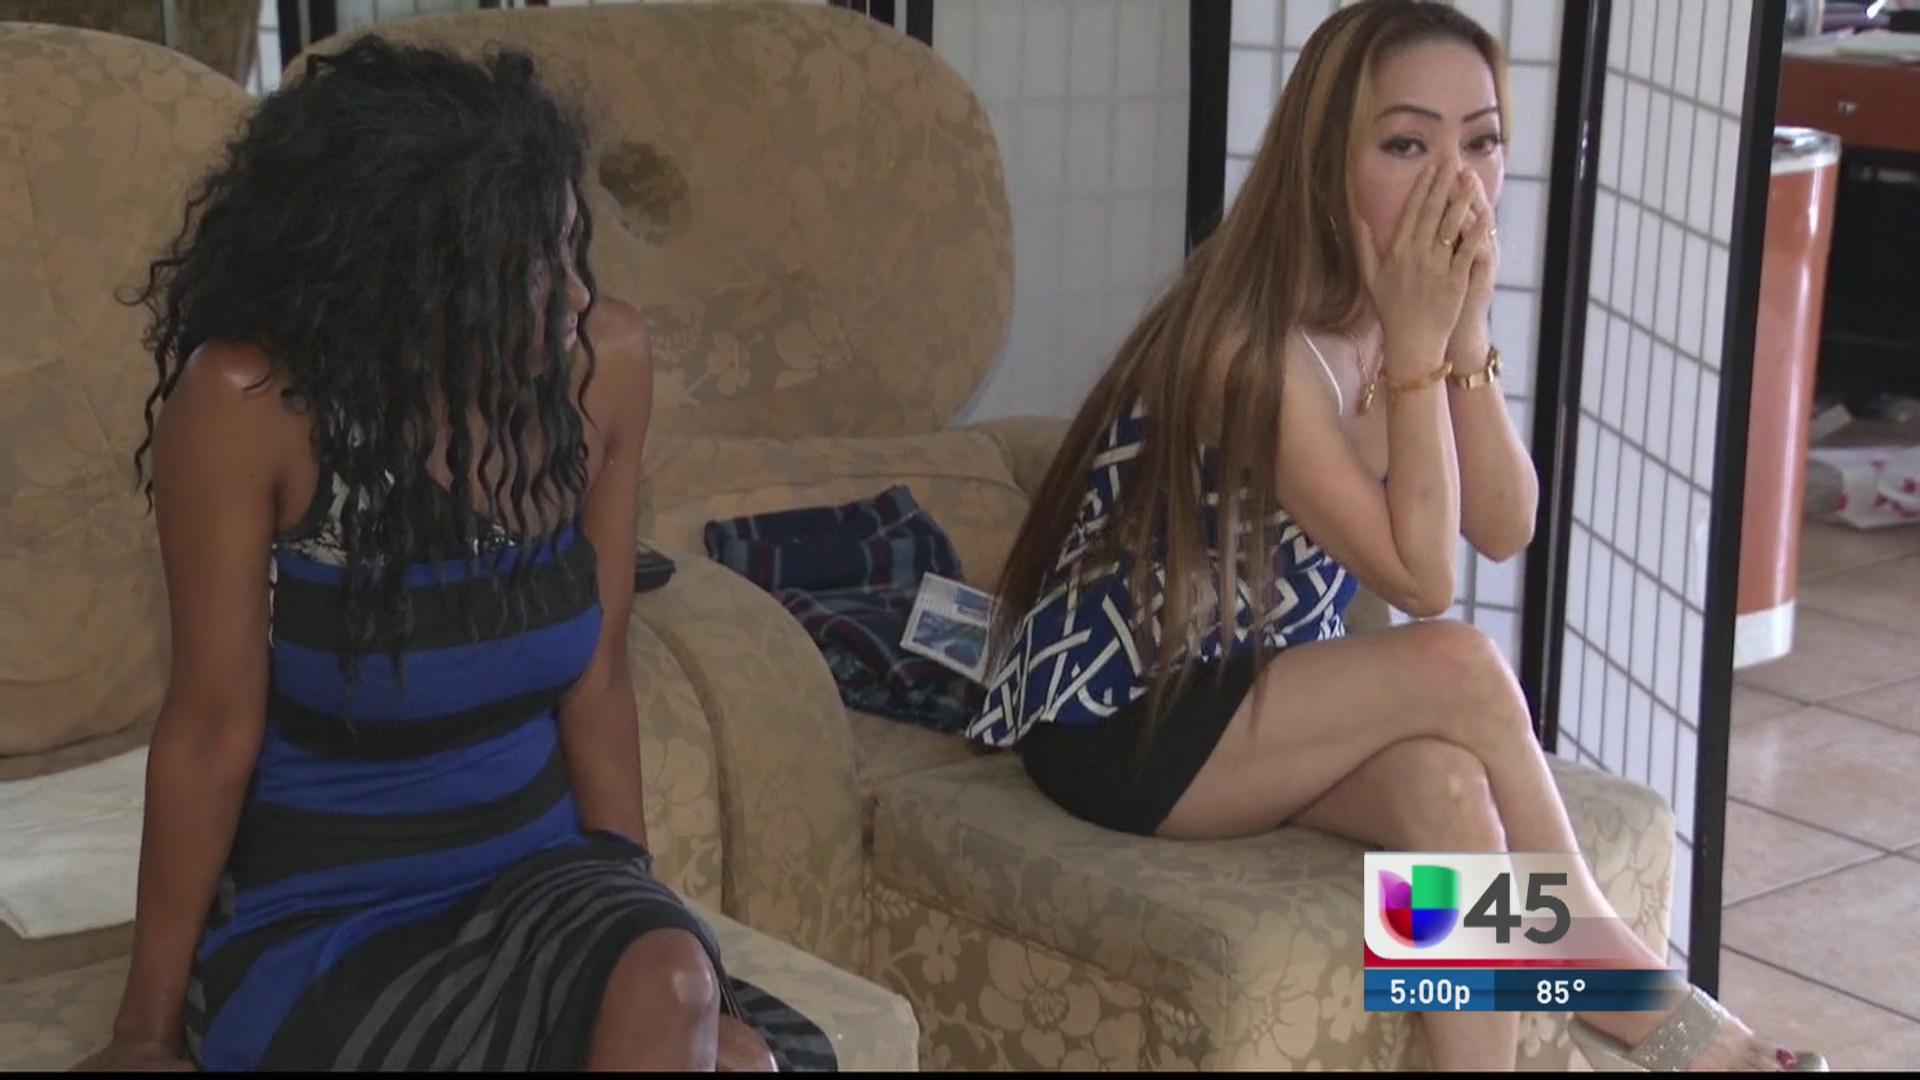 Citas Chicas En Tucson Sexo Whatsapp El Ejido-84555